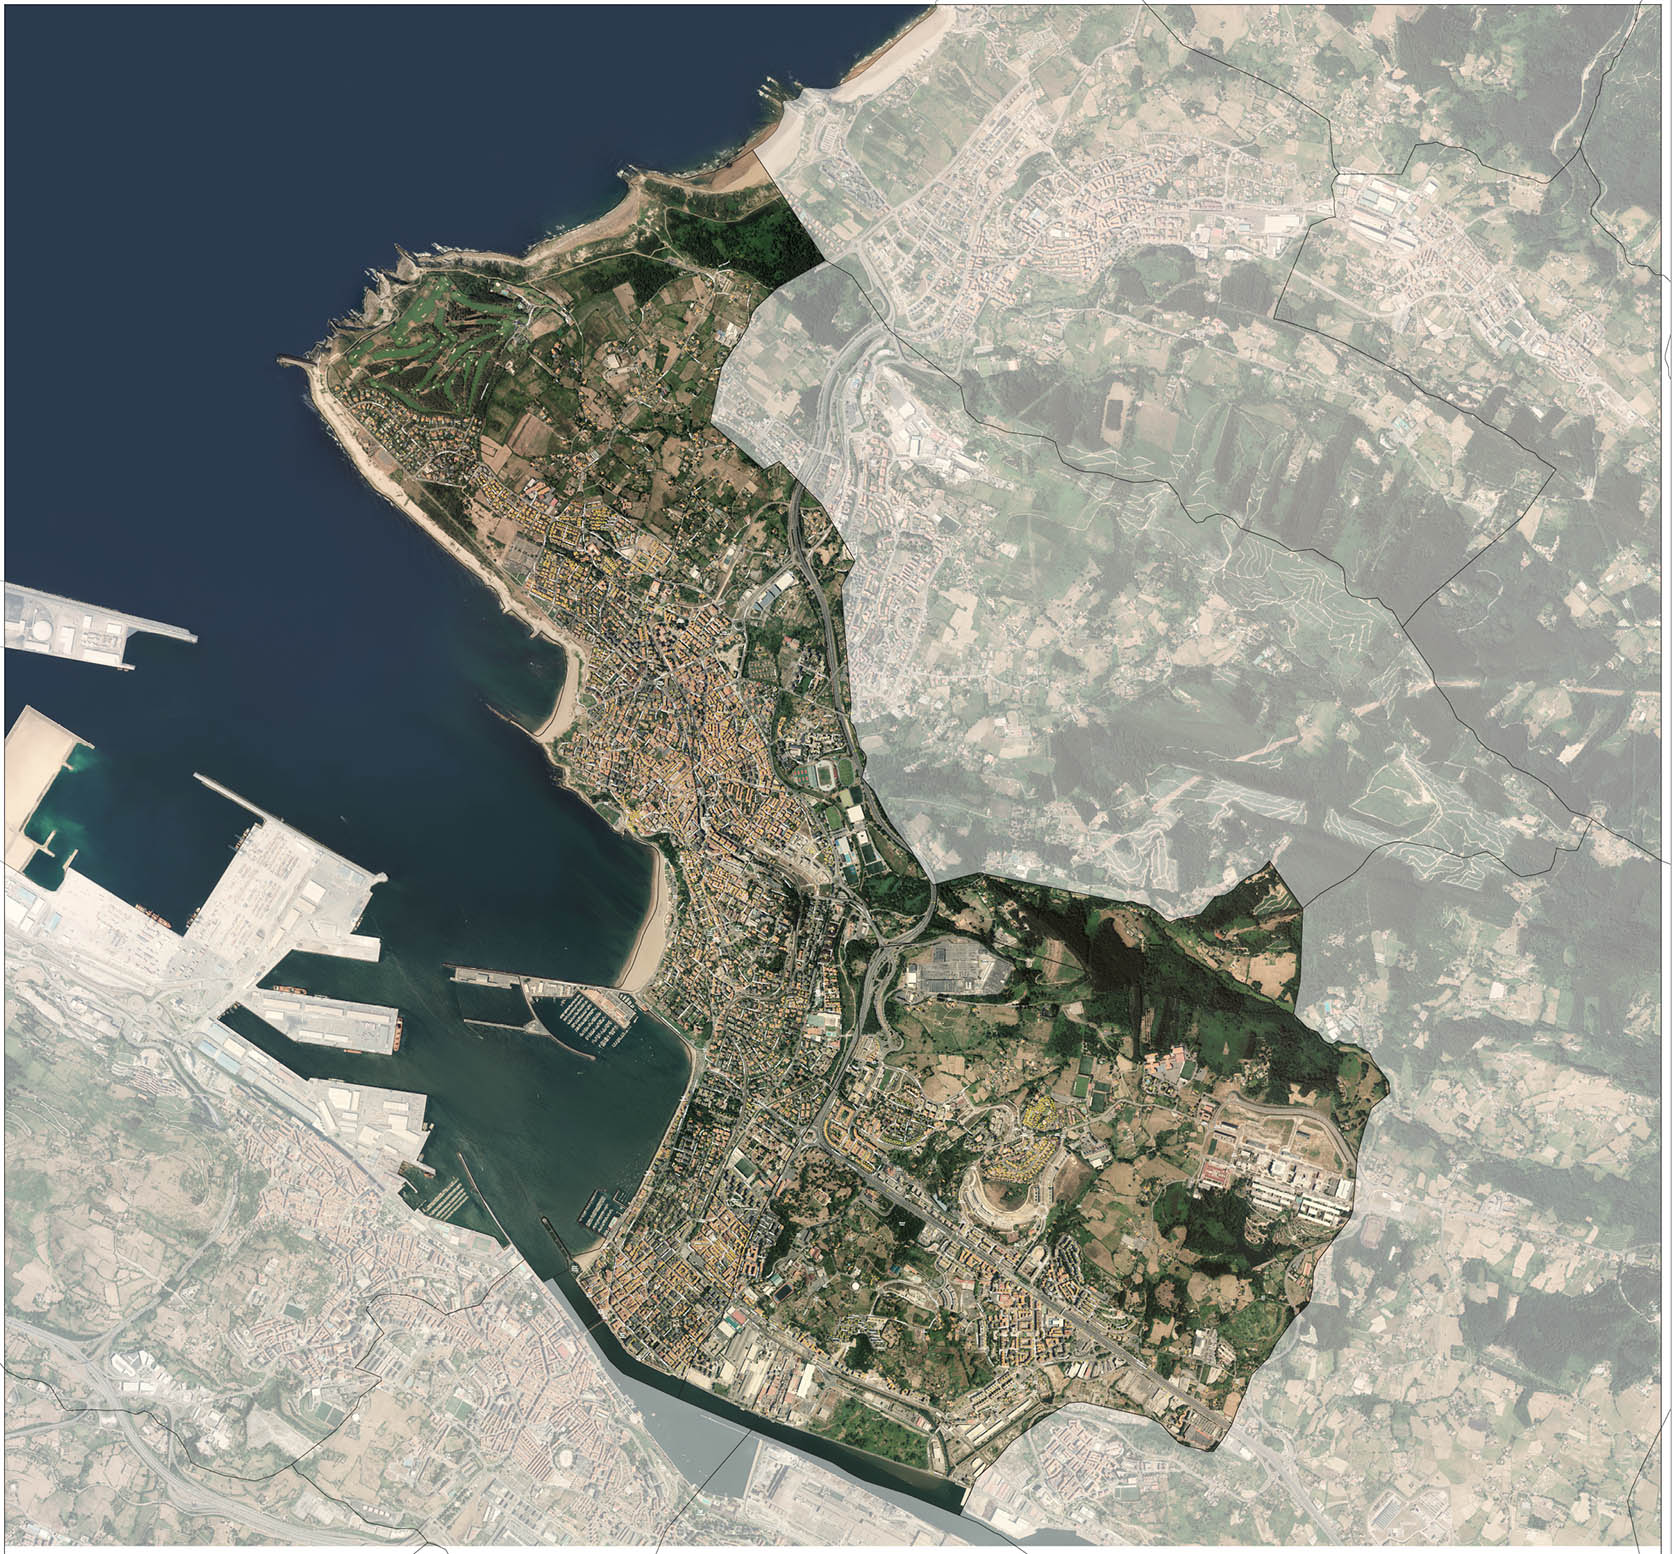 Getxo and Leioa - digital map